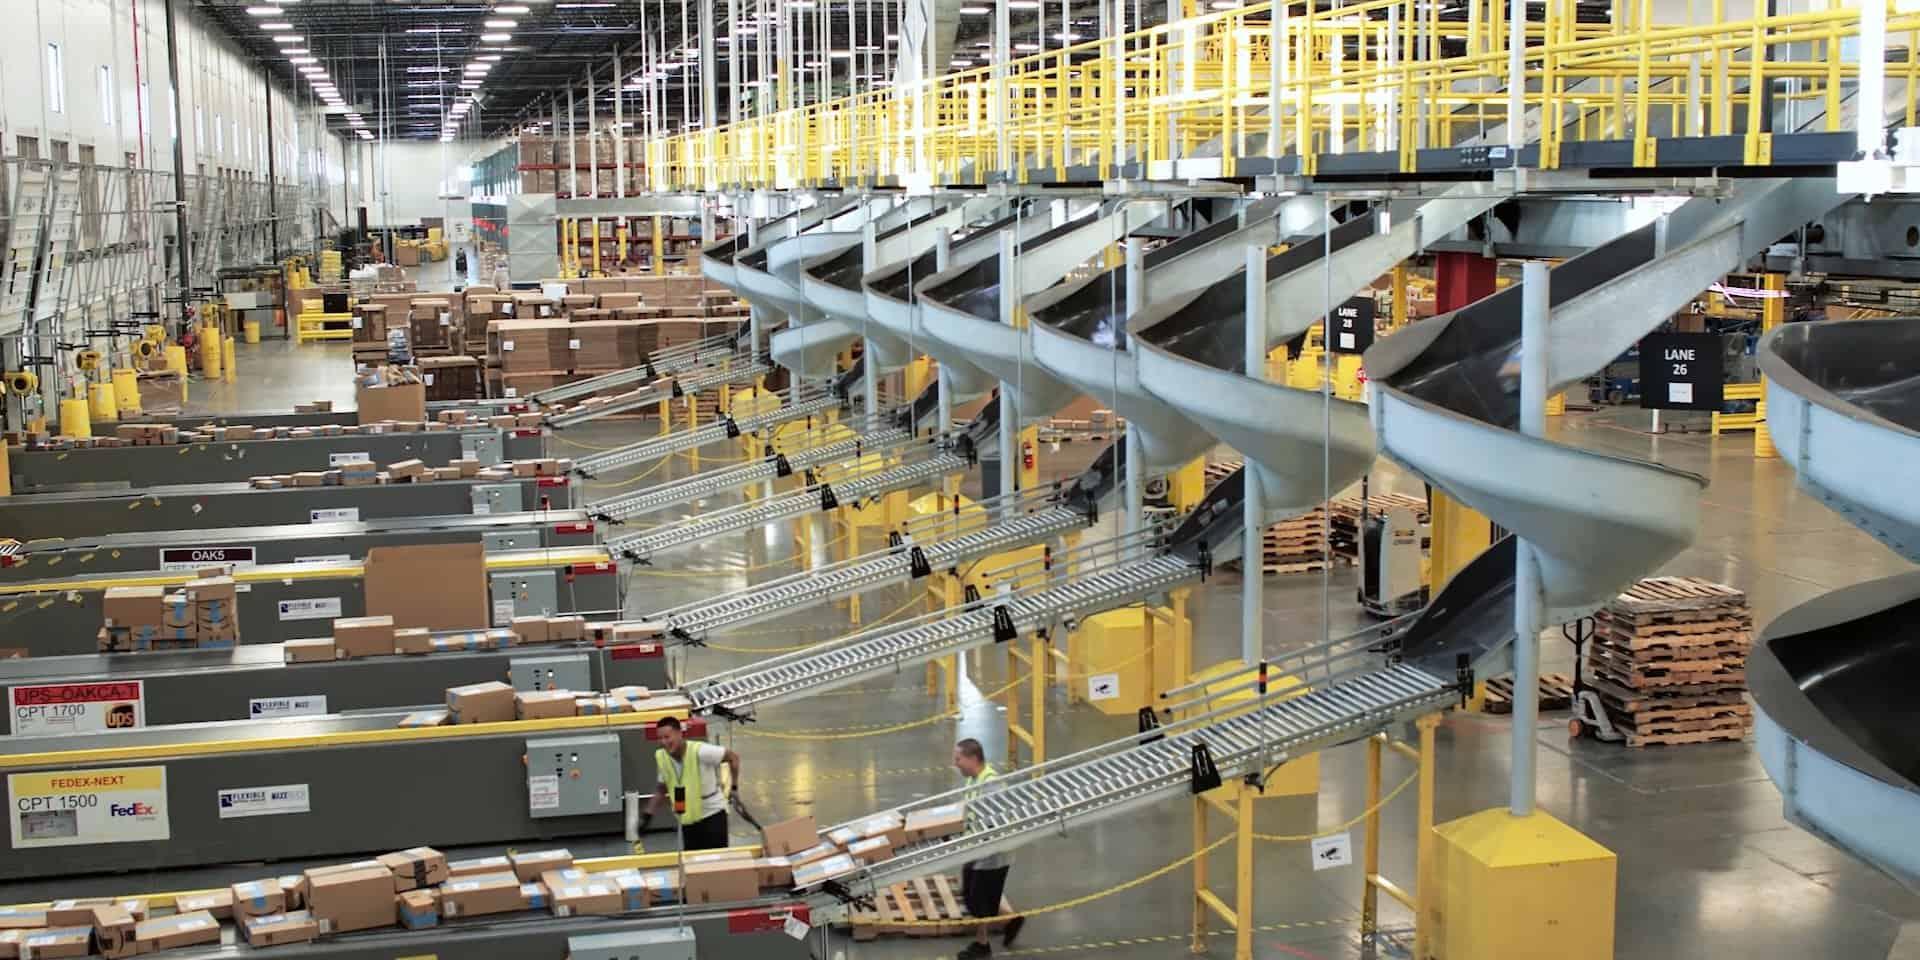 inside an amazon warehouse